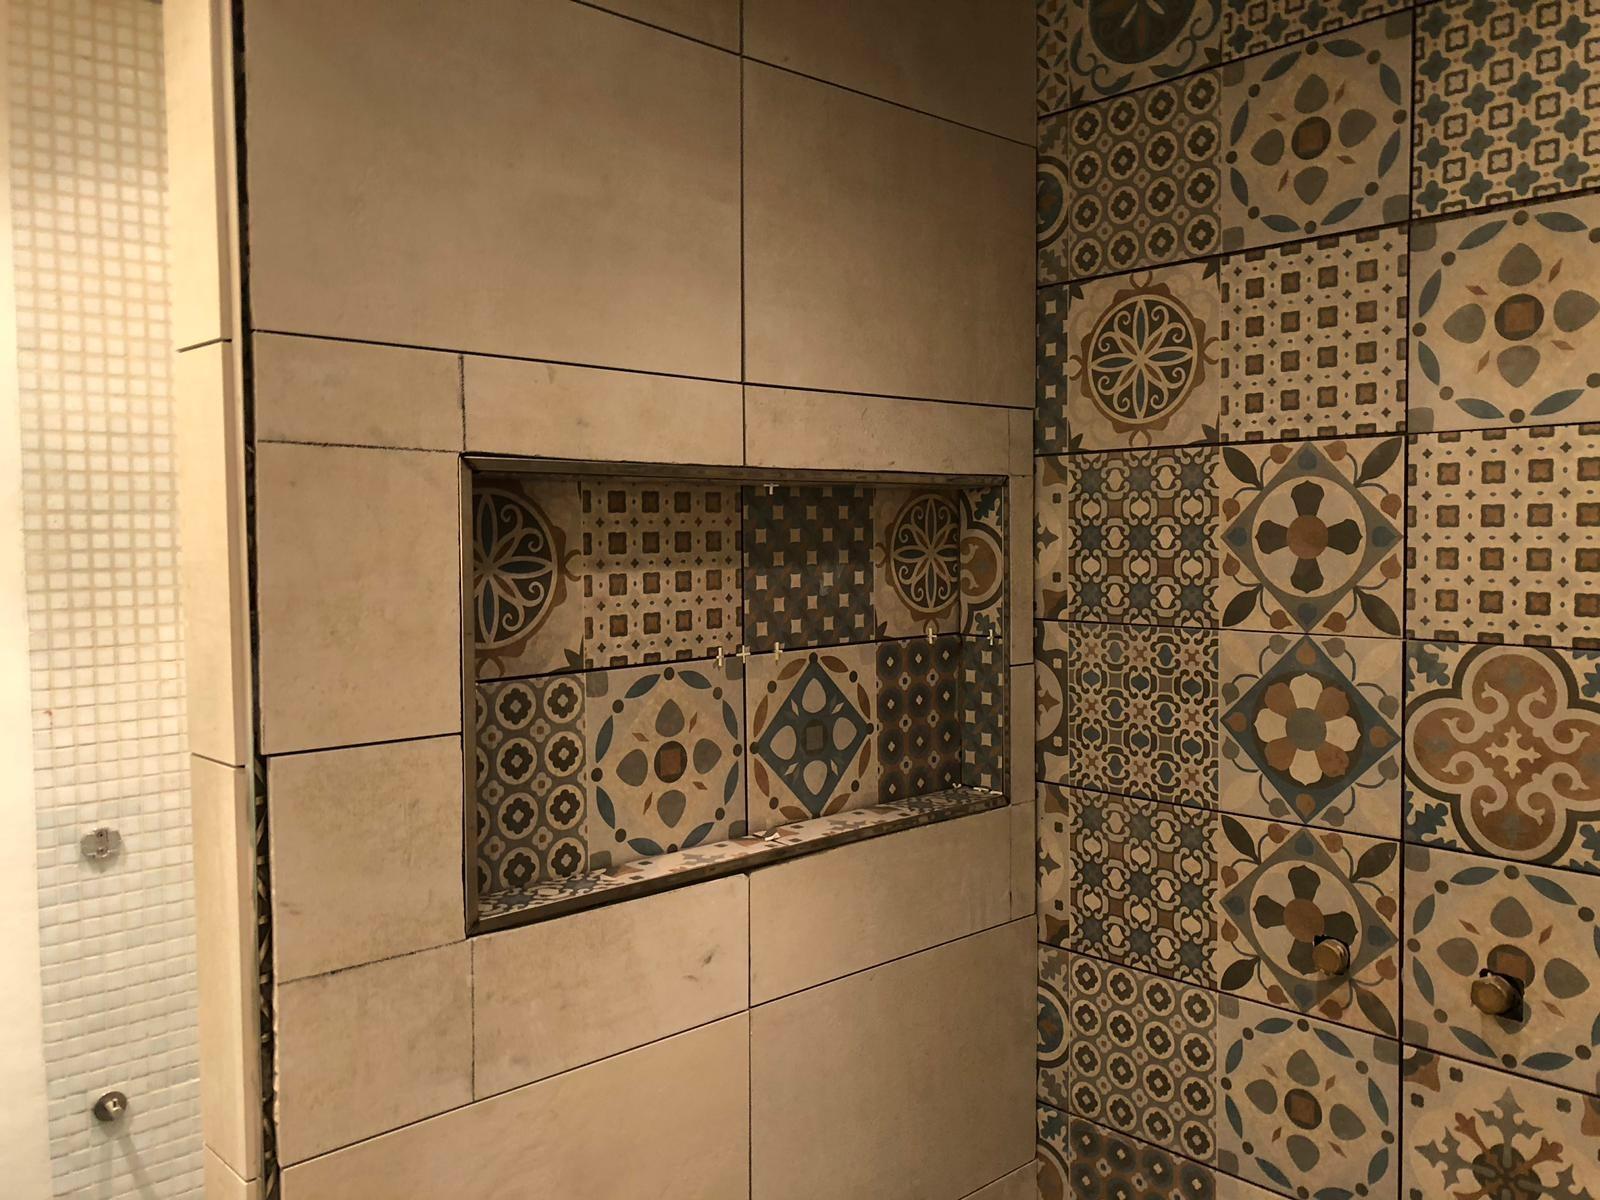 Badkamer opnieuw betegelen en lekkage probleem oplossen werkspot